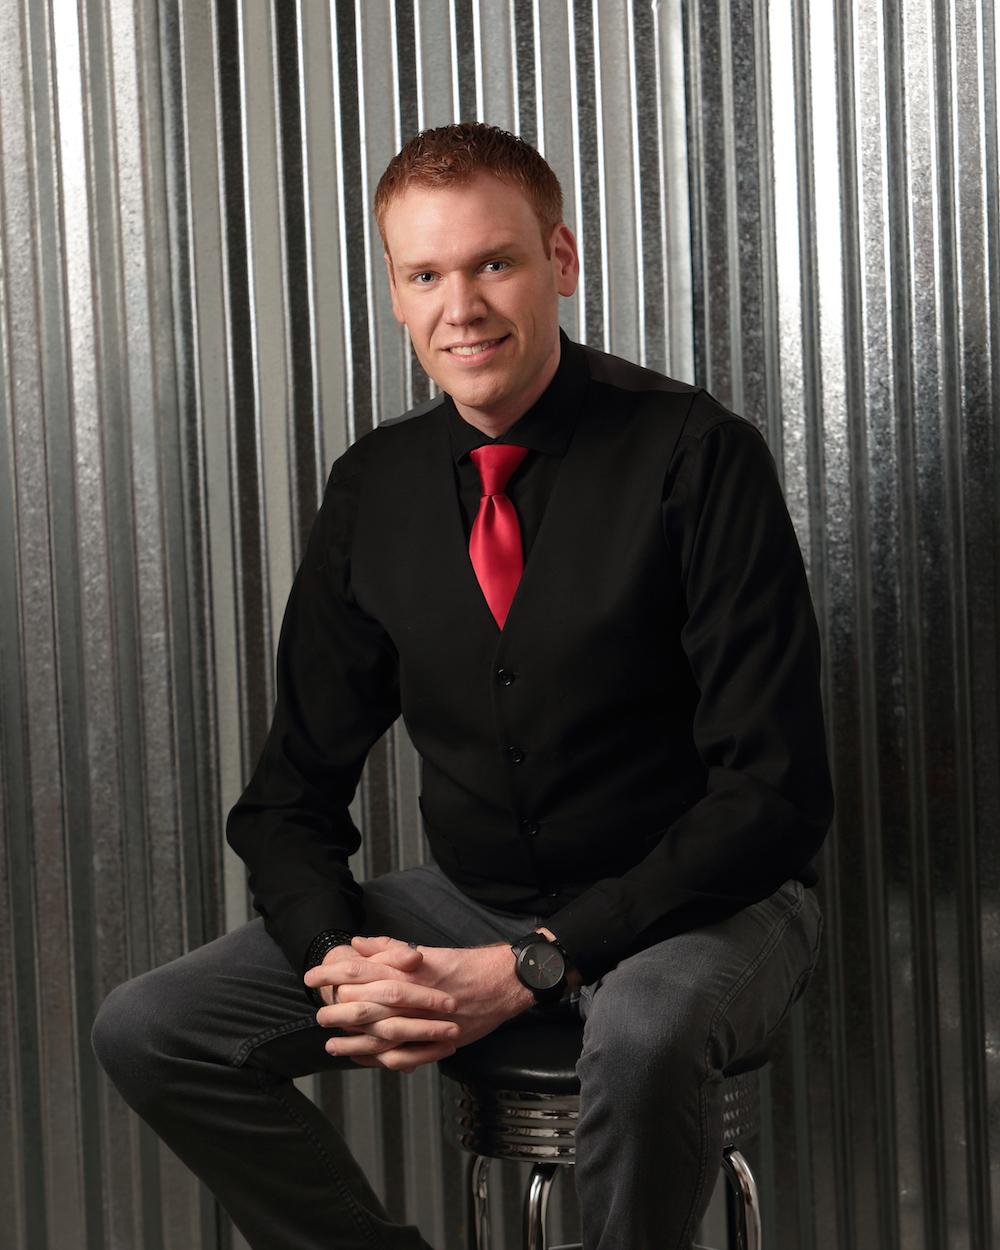 Jeff Veley Peace Ambassador Motivational Speaker Web.jpg